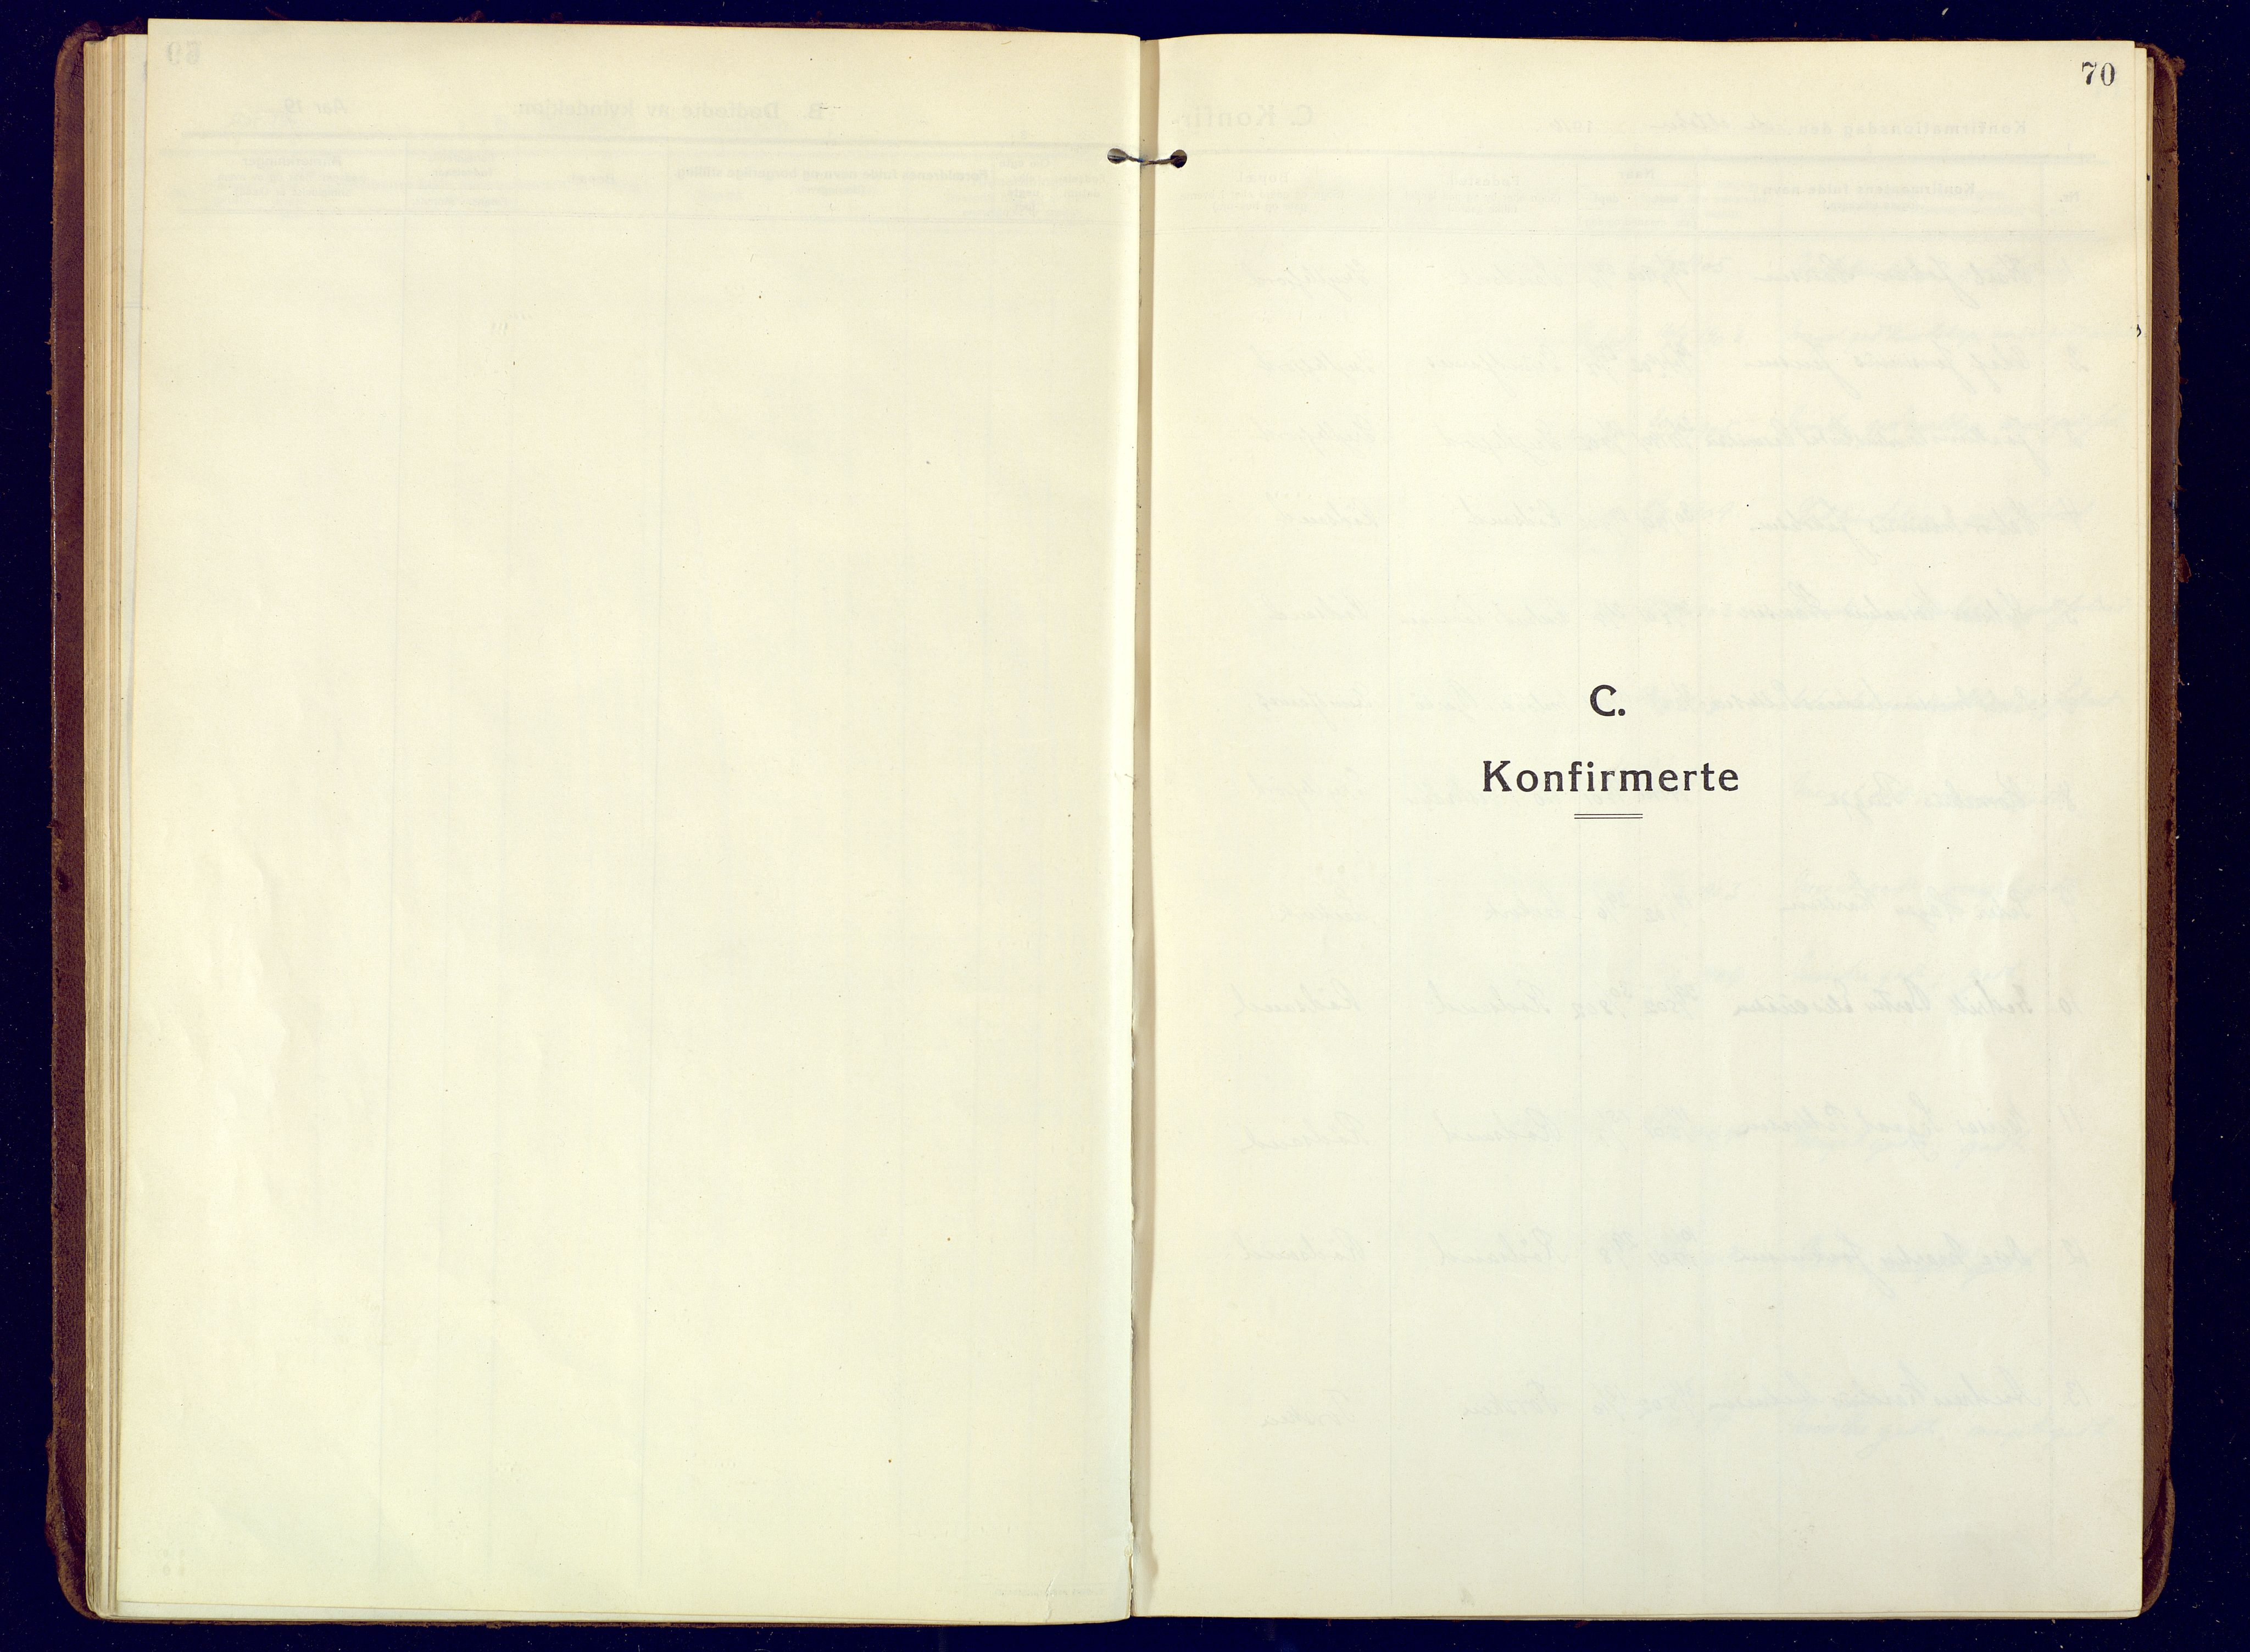 SATØ, Mefjord/Berg sokneprestkontor, G/Ga/Gaa: Ministerialbok nr. 10, 1916-1928, s. 70